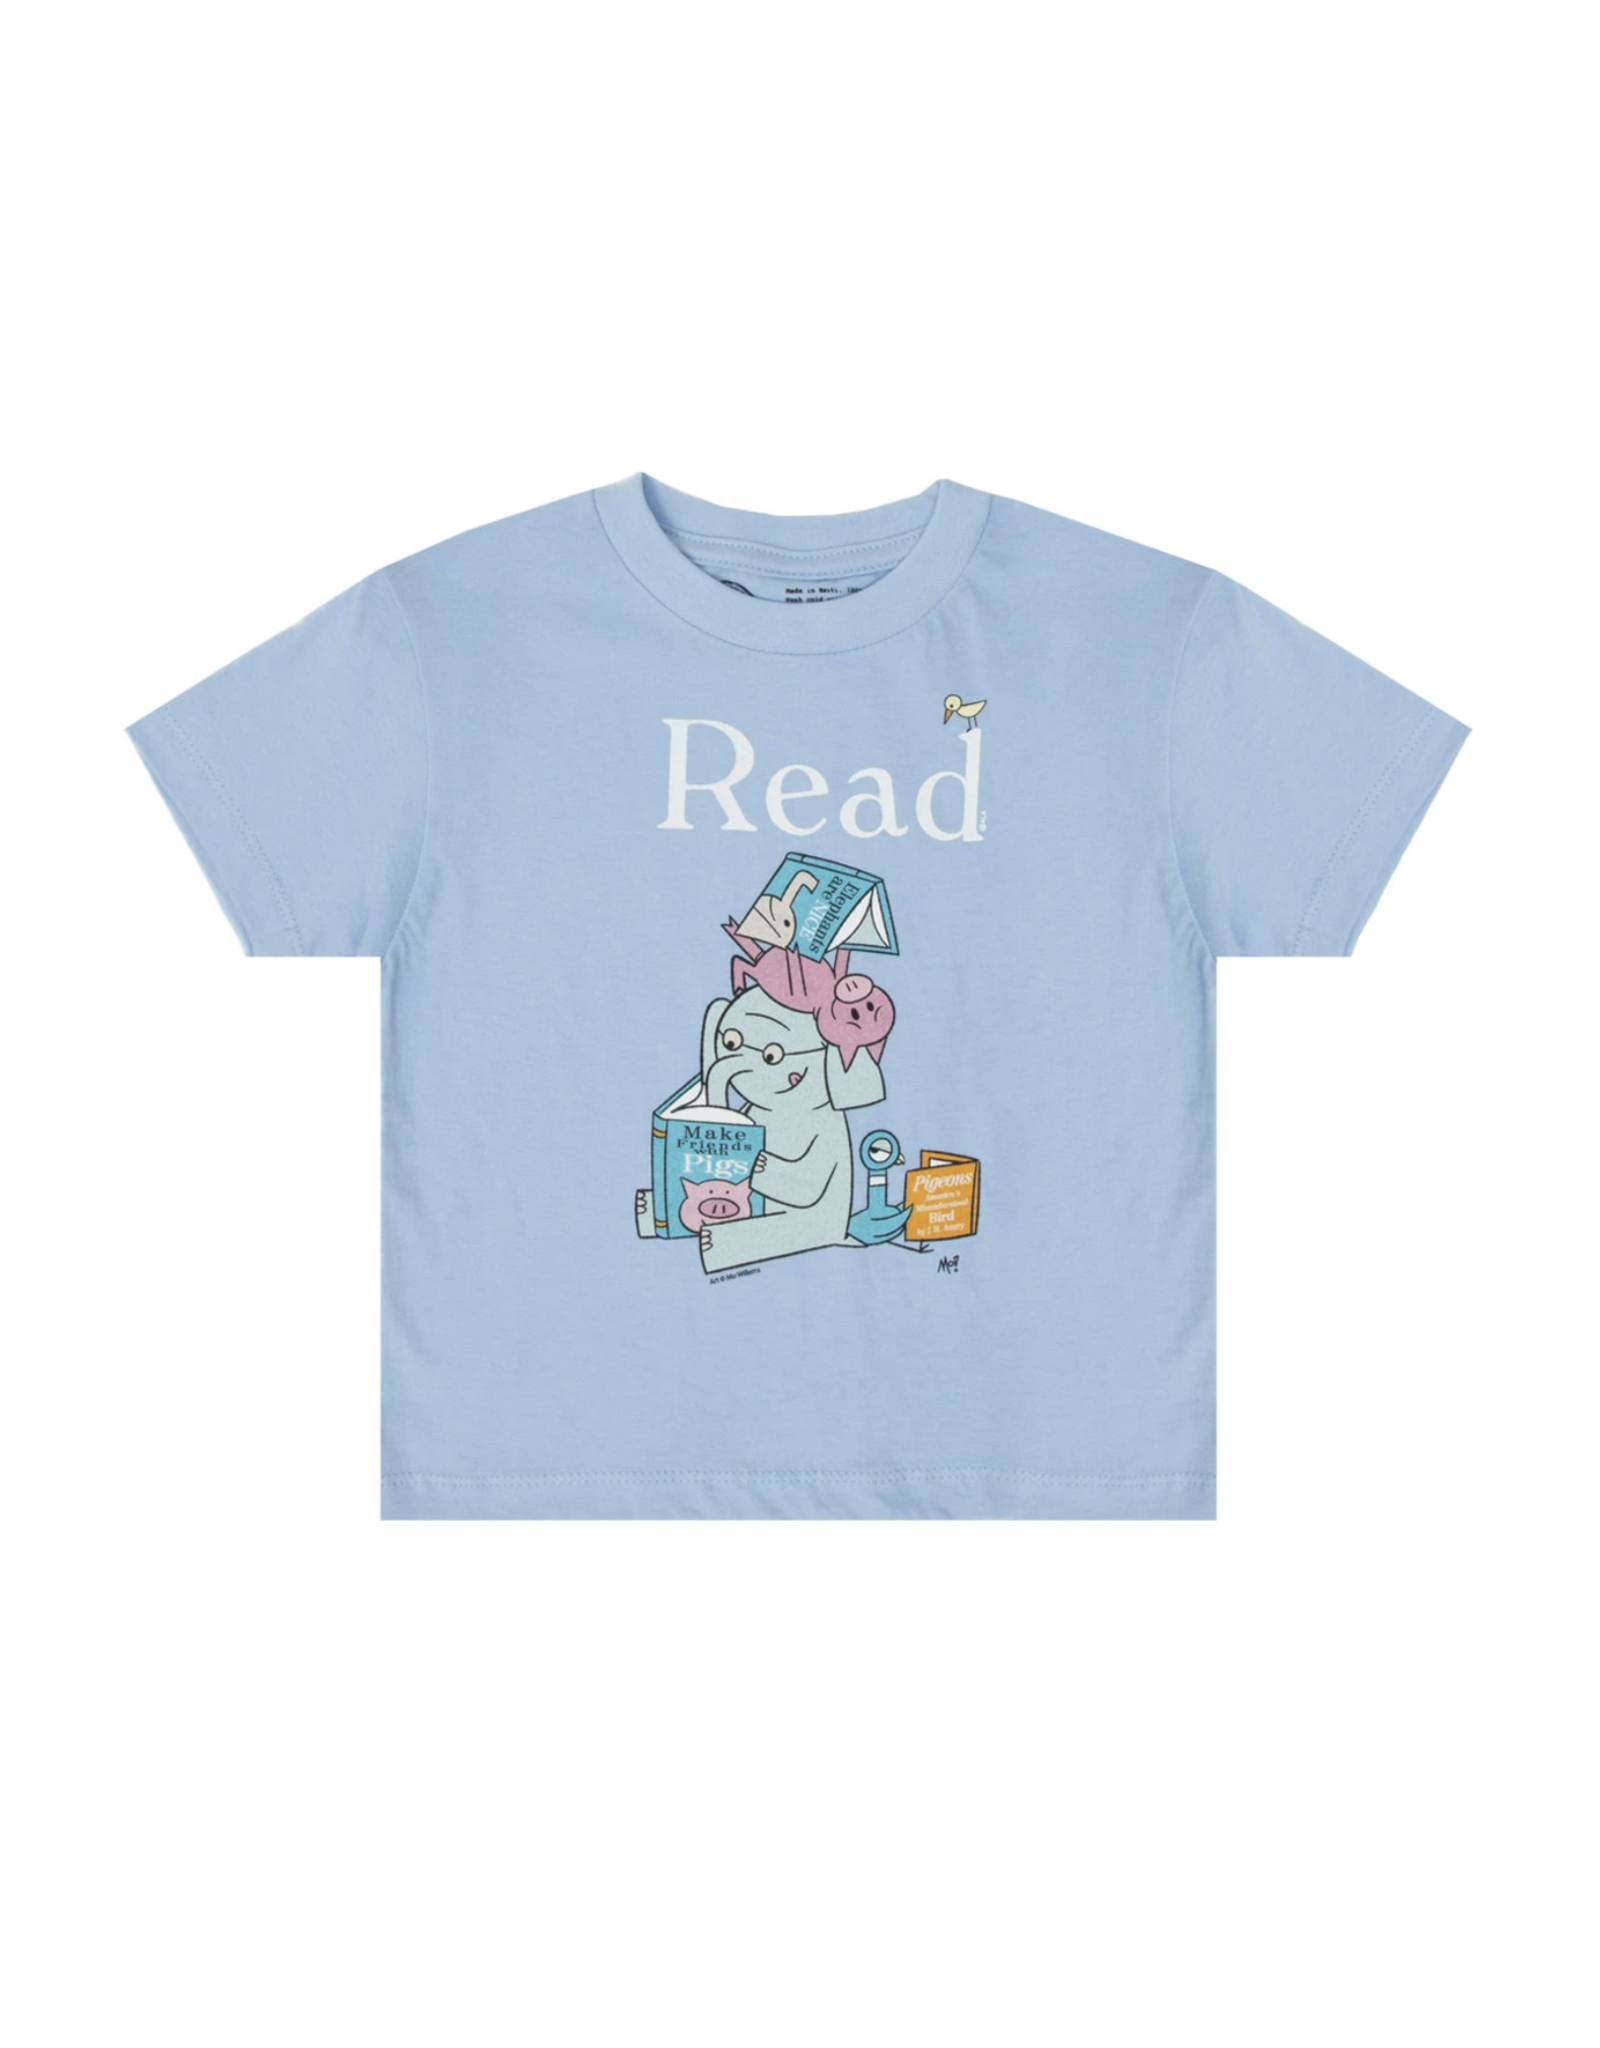 Elephant & Piggie Read Kid's T-Shirt